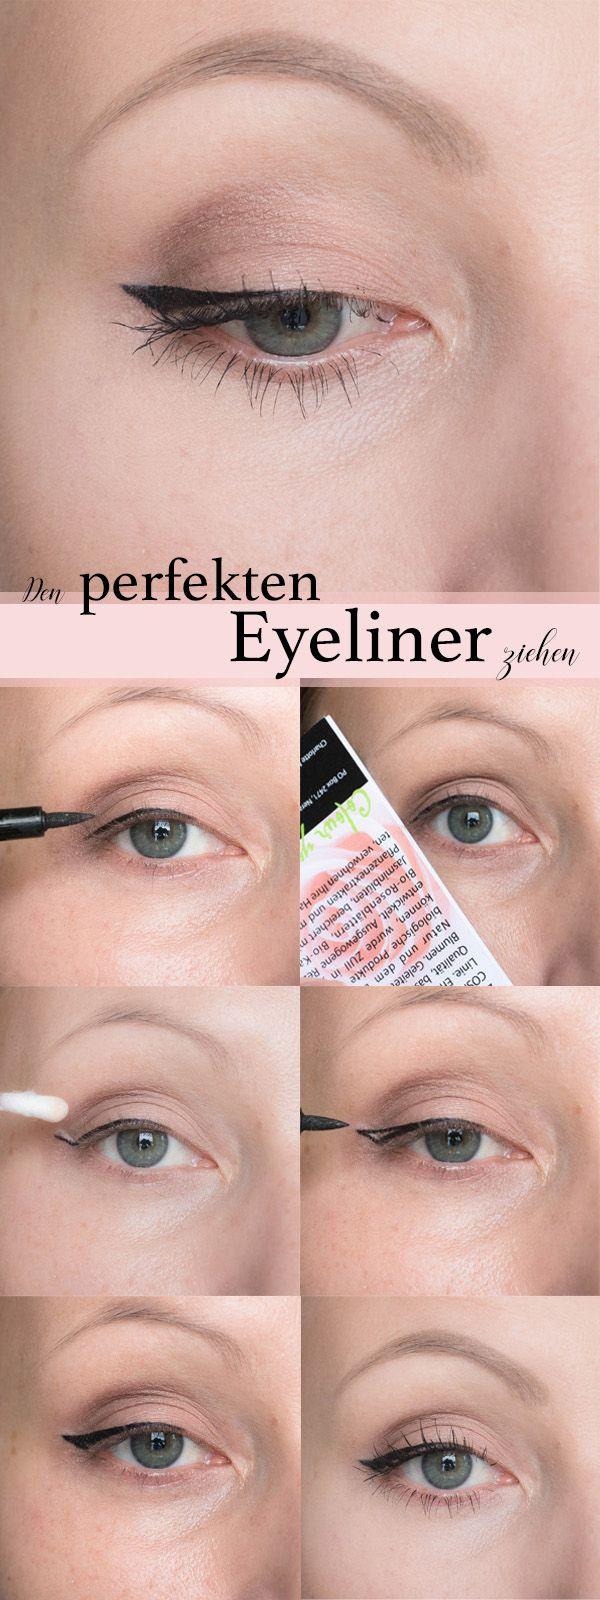 Den perfekten Lidstrich ziehen! Make up Tutorial auf Lovelycatificatio… #eyeli…